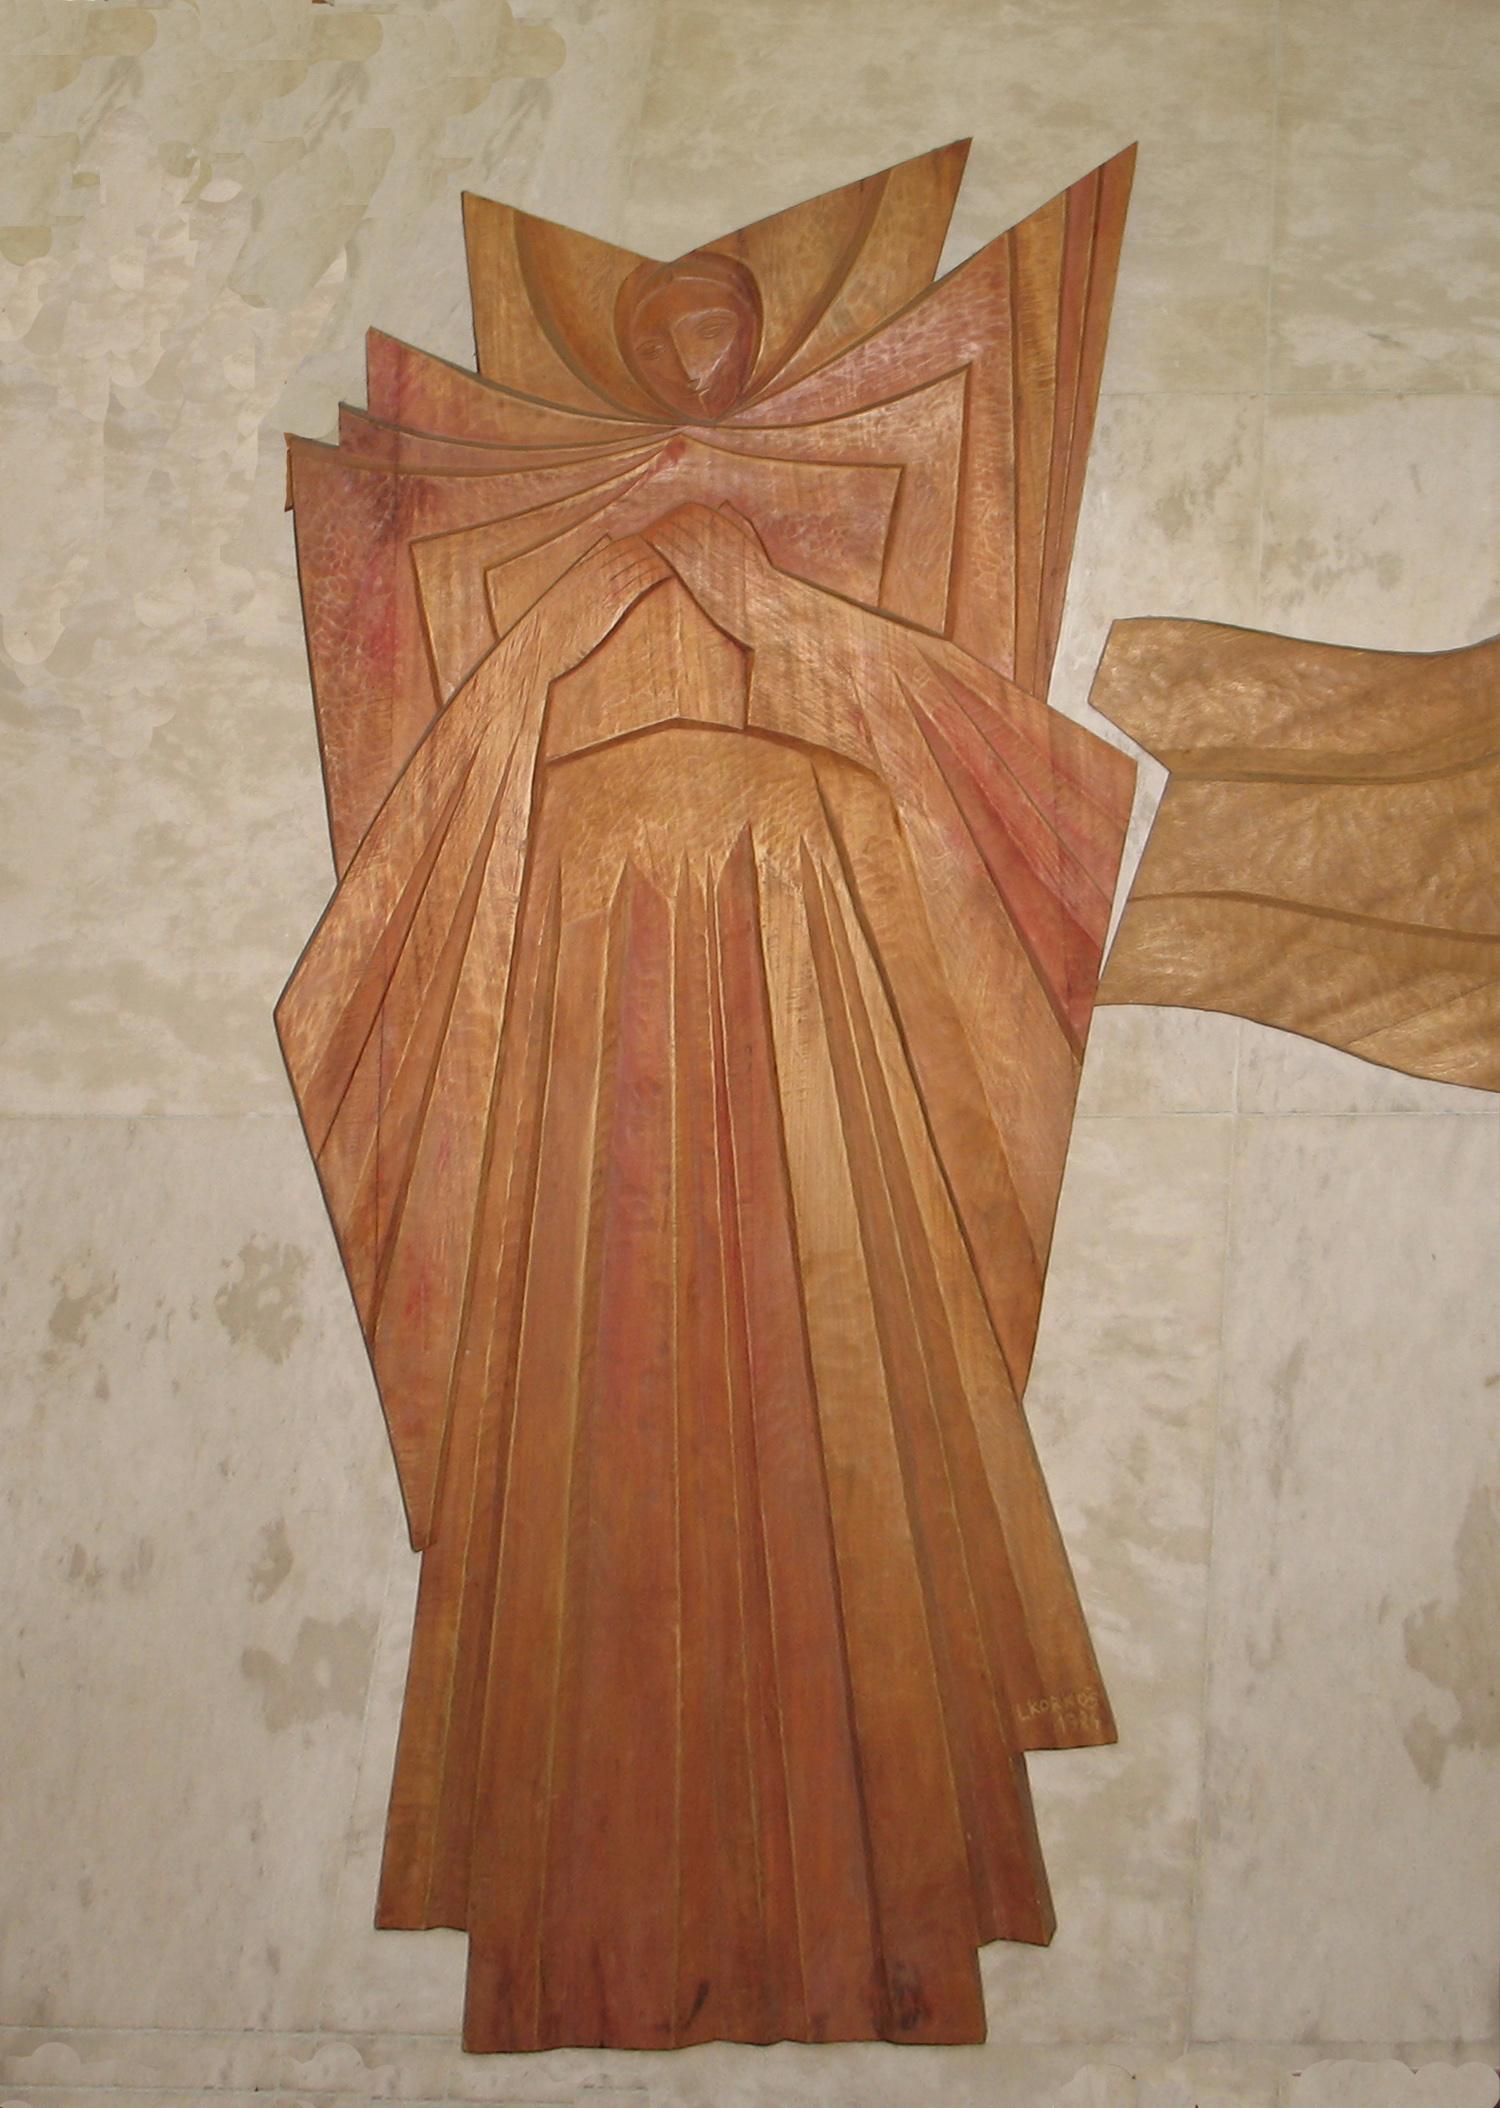 Description korkos ludwik relief drevorezba